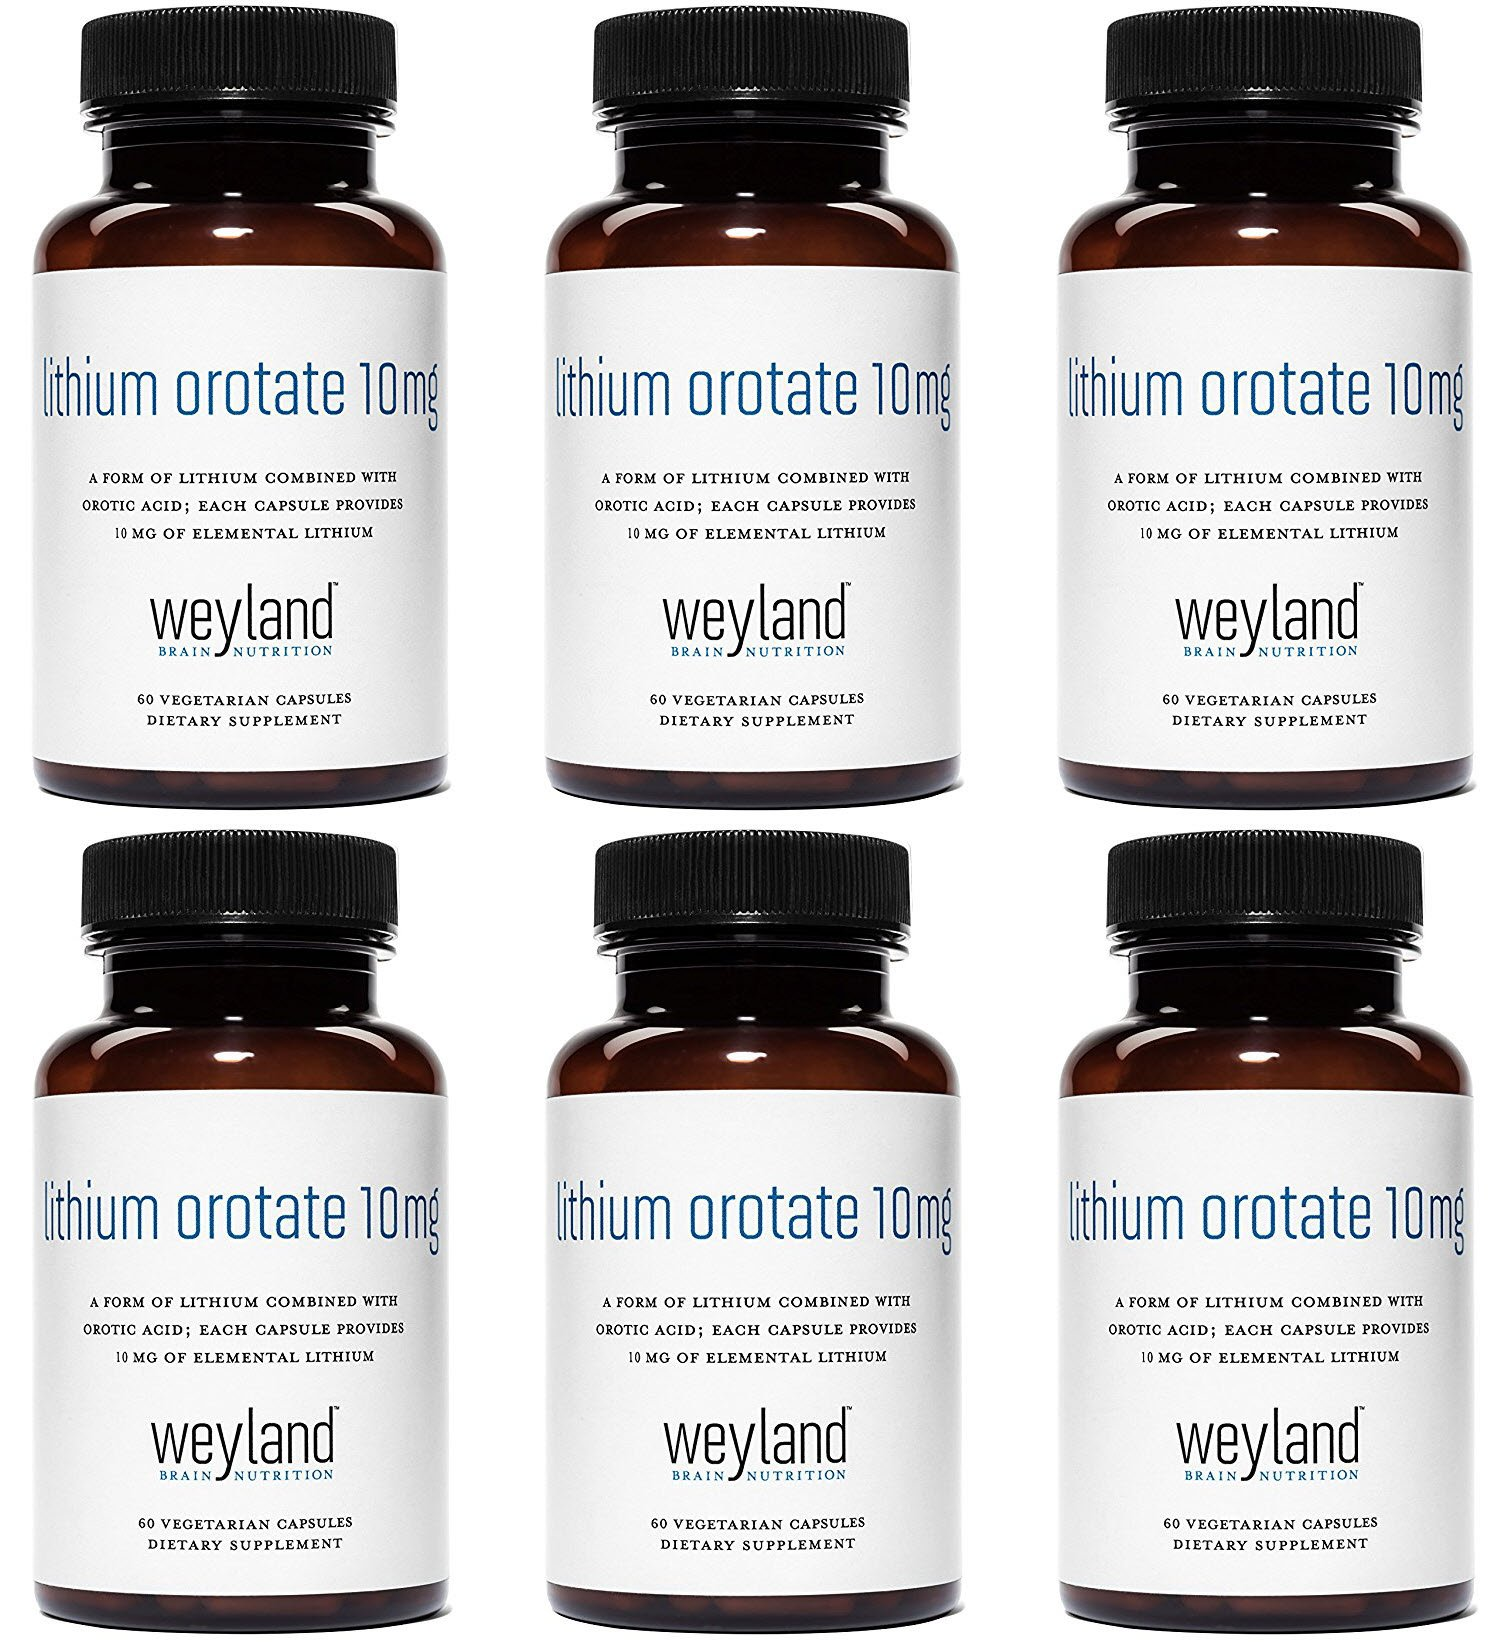 Weyland: Lithium Orotate - 10mg of Elemental Lithium (as Lithium Orotate) per Vegetarian Capsule (6 Bottles)